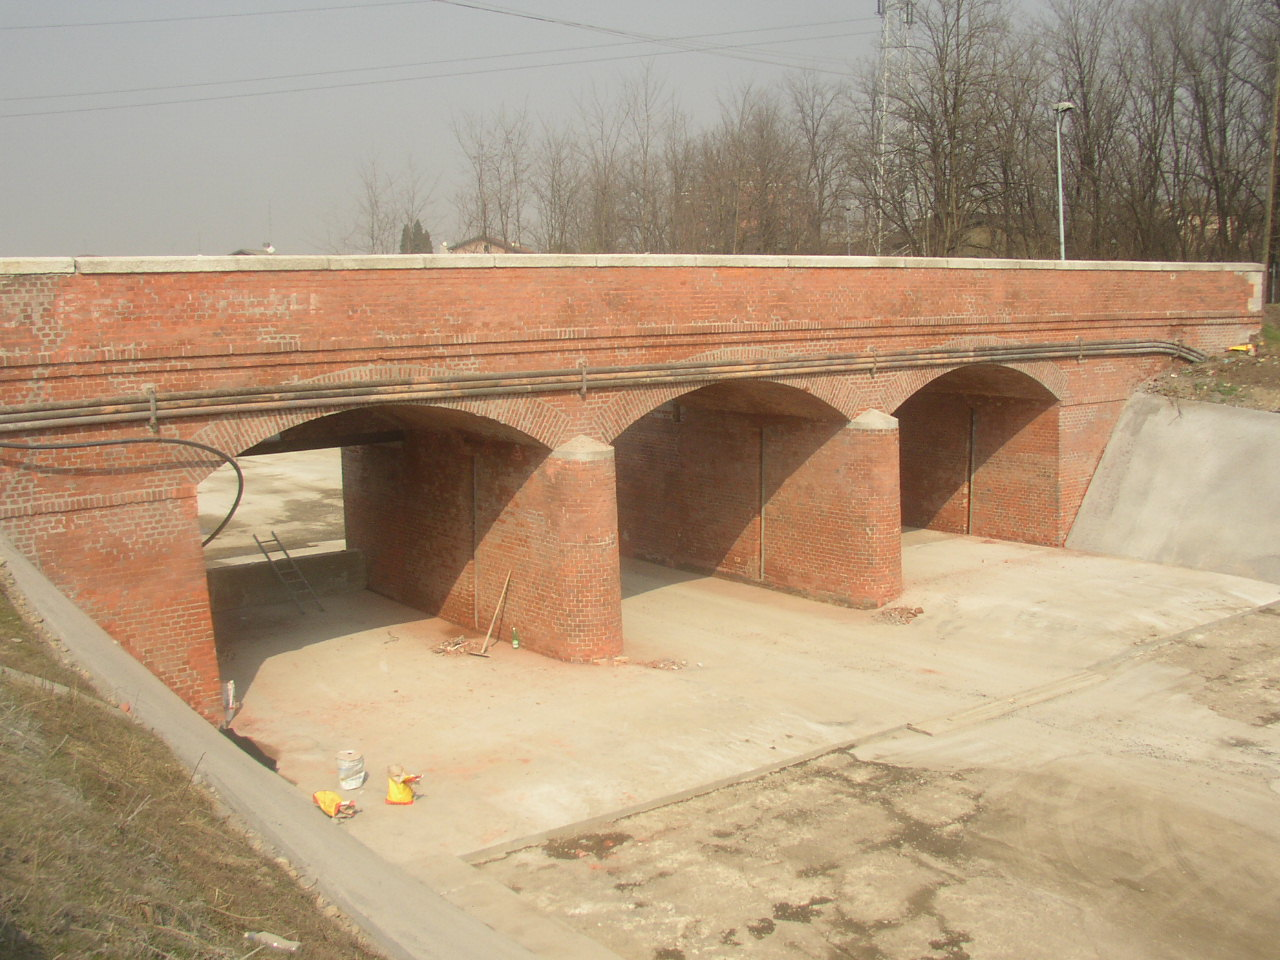 07-Intervento su ponte esistente